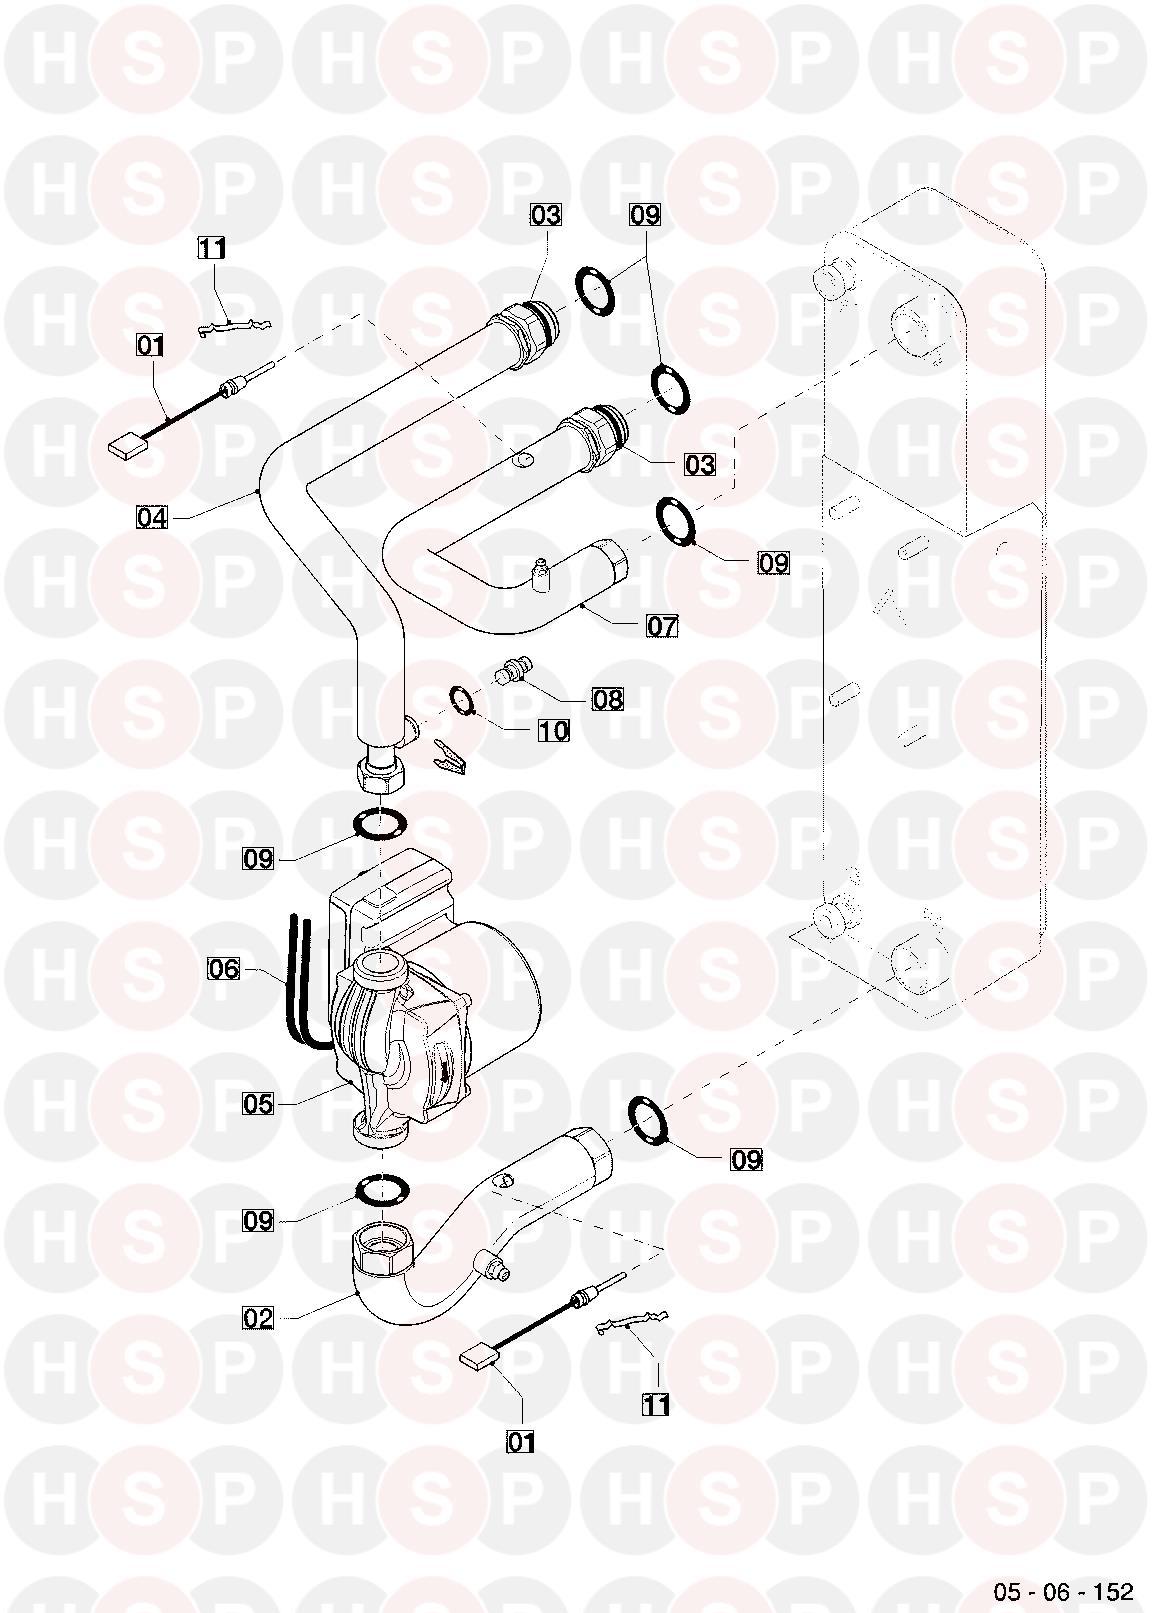 Vaillant VWL 55/2 A 230V 2014 Onwards Appliance Diagram